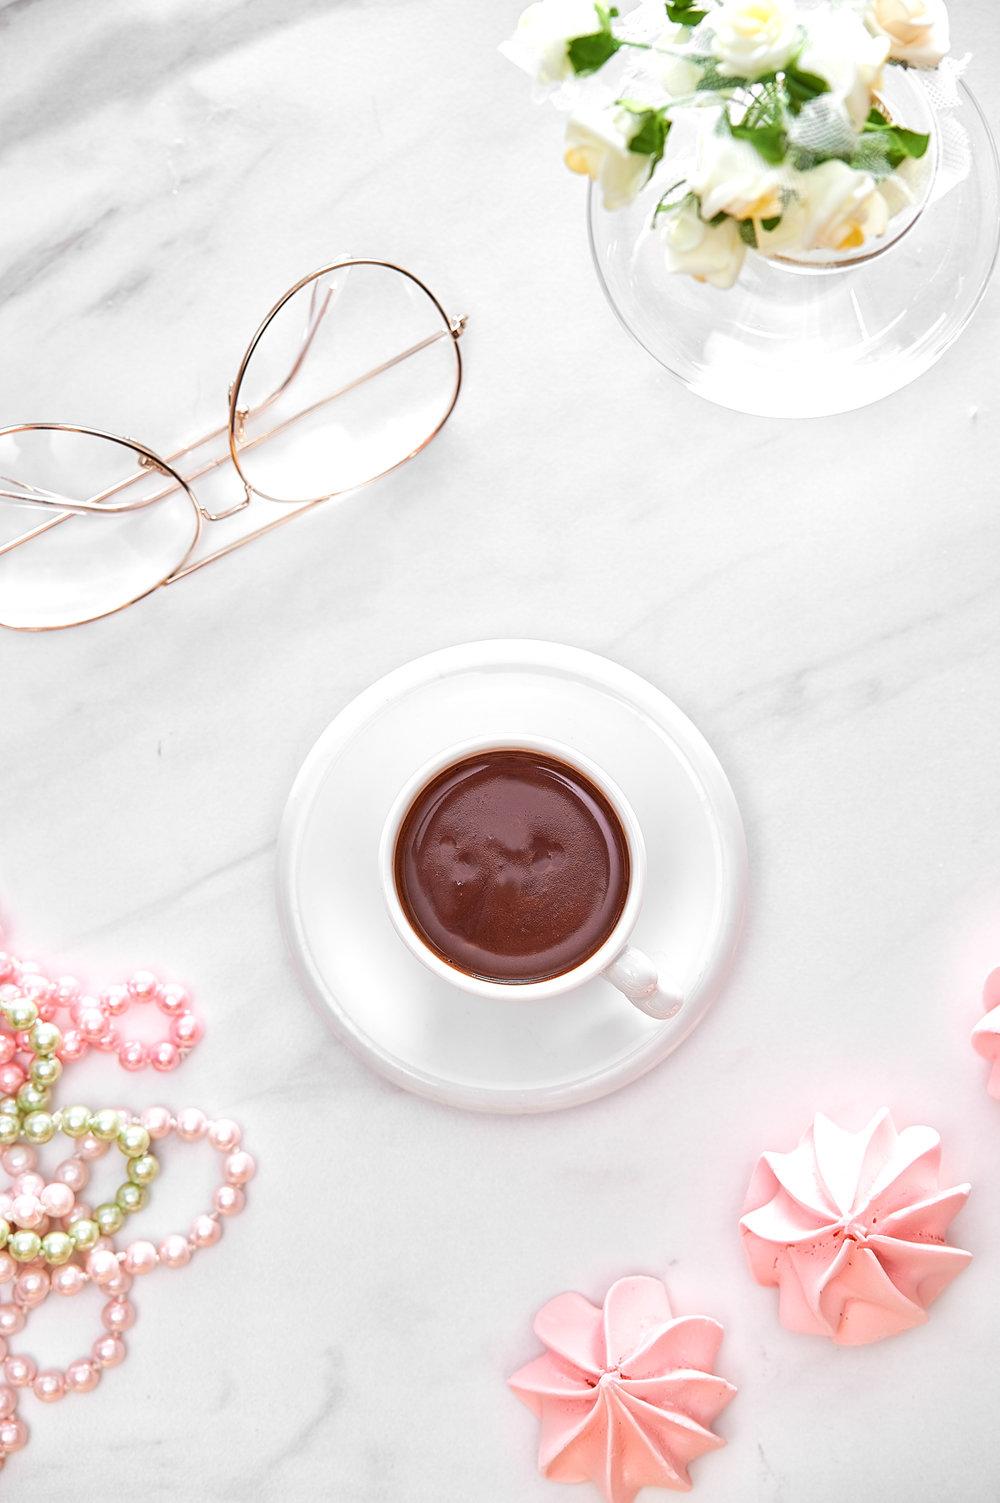 lifestyle, product, coffee, tasty, flat lay, akademia fotografii, fotografia, photo, studio meksyk, Justyna Pankowska,.jpg